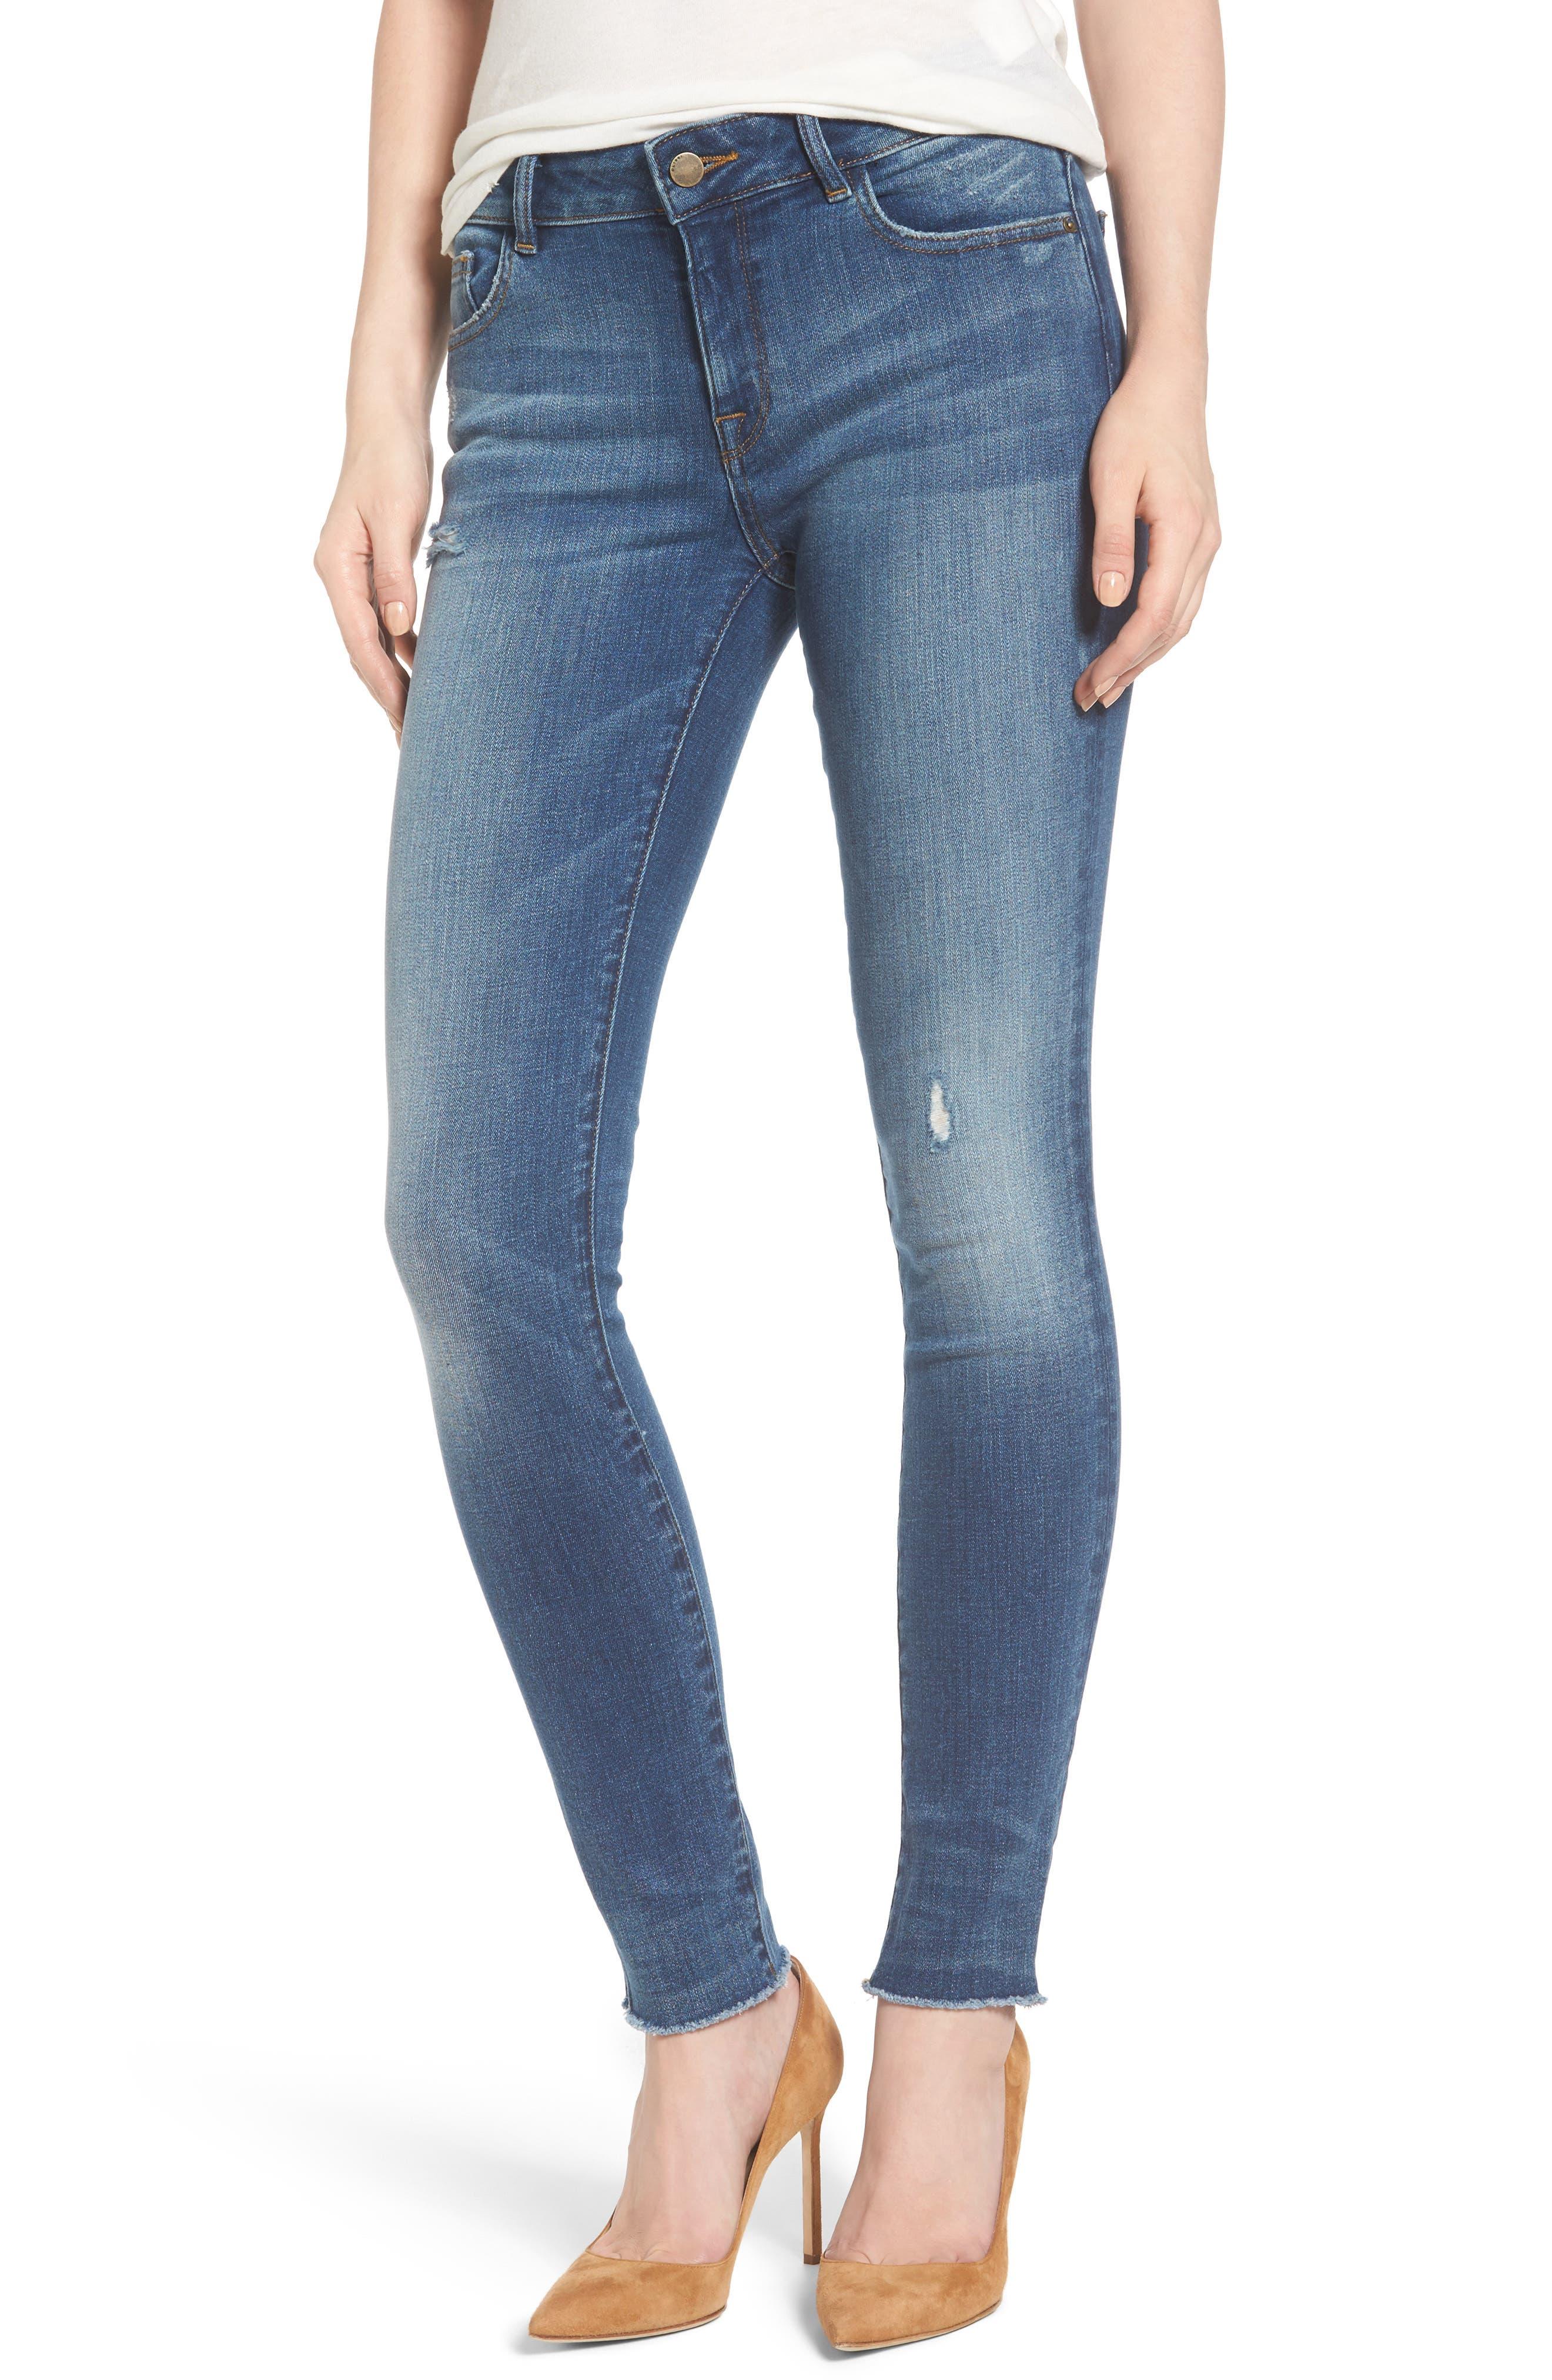 Main Image - DL1961 Florence Instasculpt Skinny Jeans